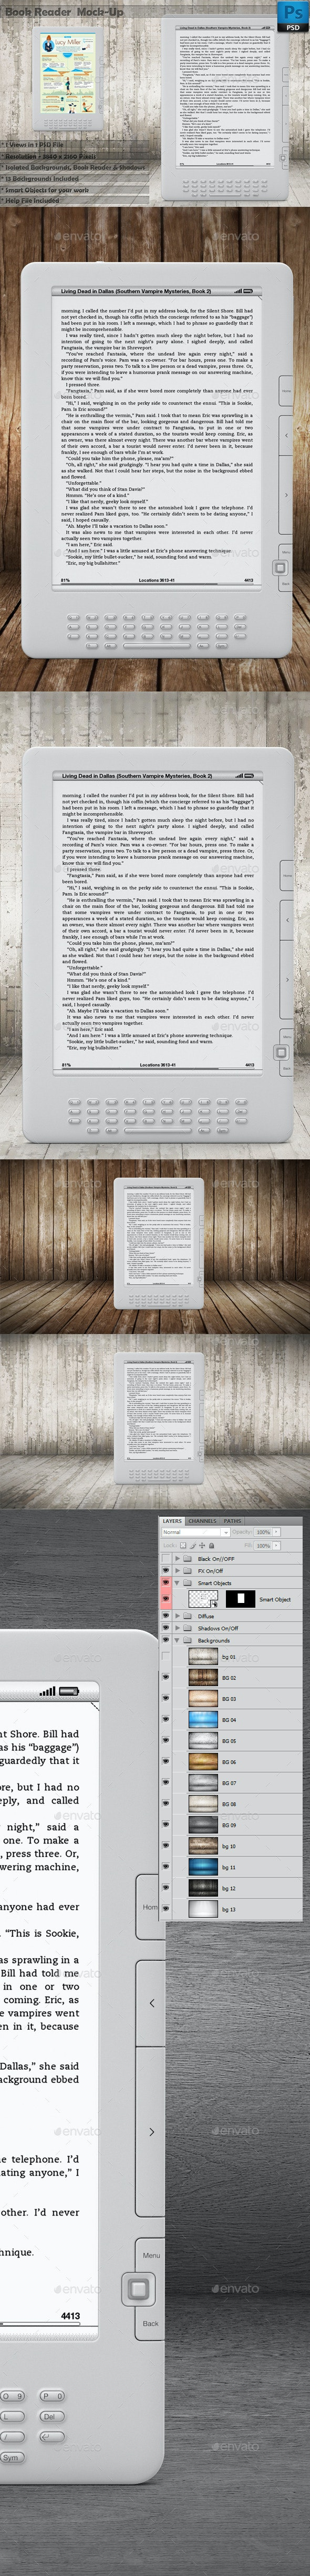 Book Reader Mockup Vol 1 - Mobile Displays